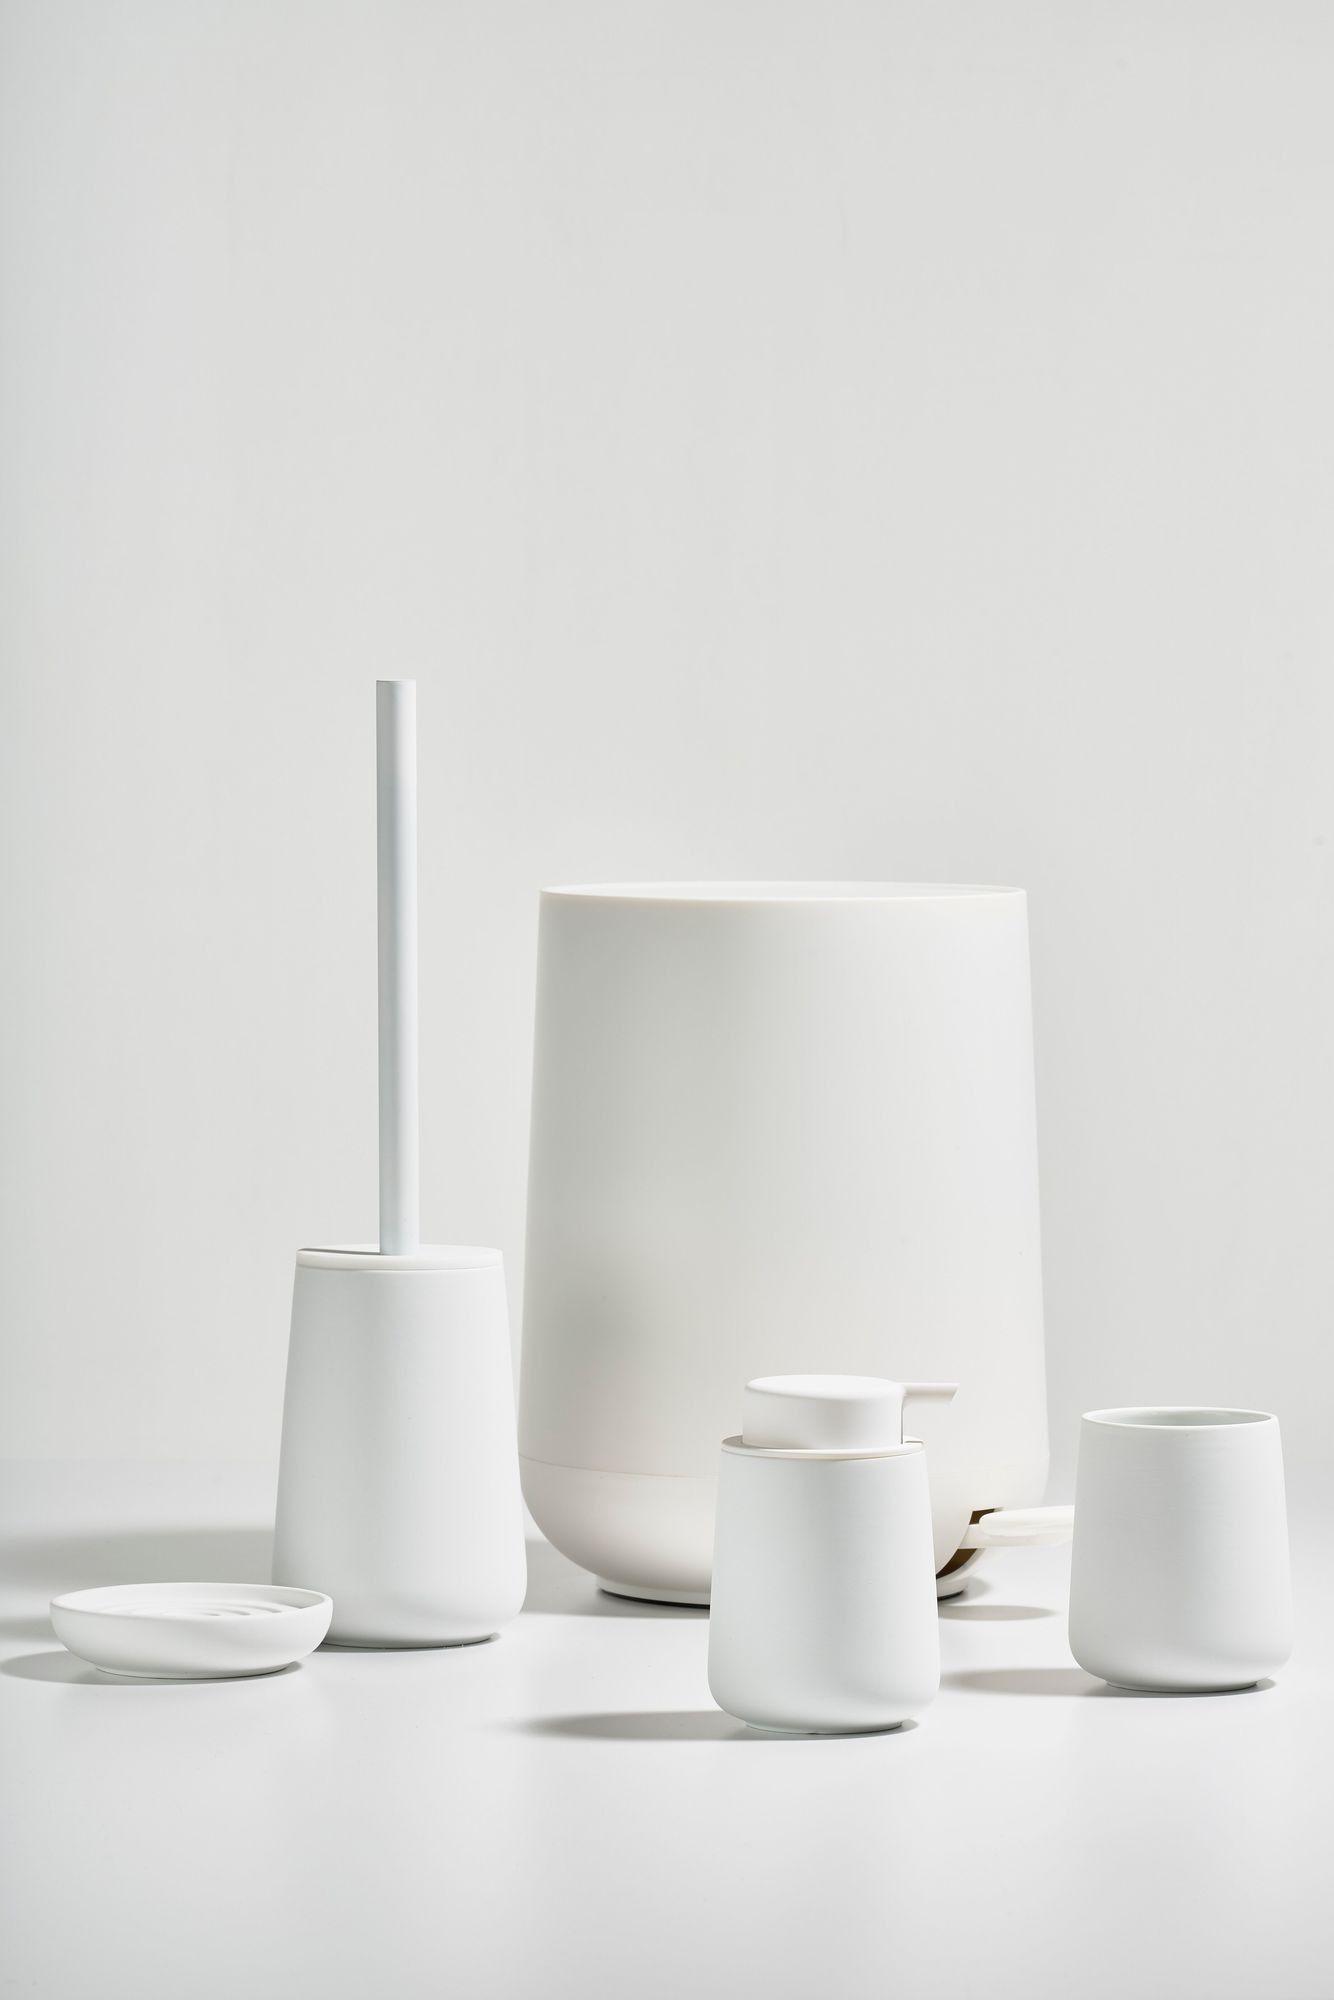 Nova One Pedaleimer Zone Denmark Einrichten Design Badezimmer Design